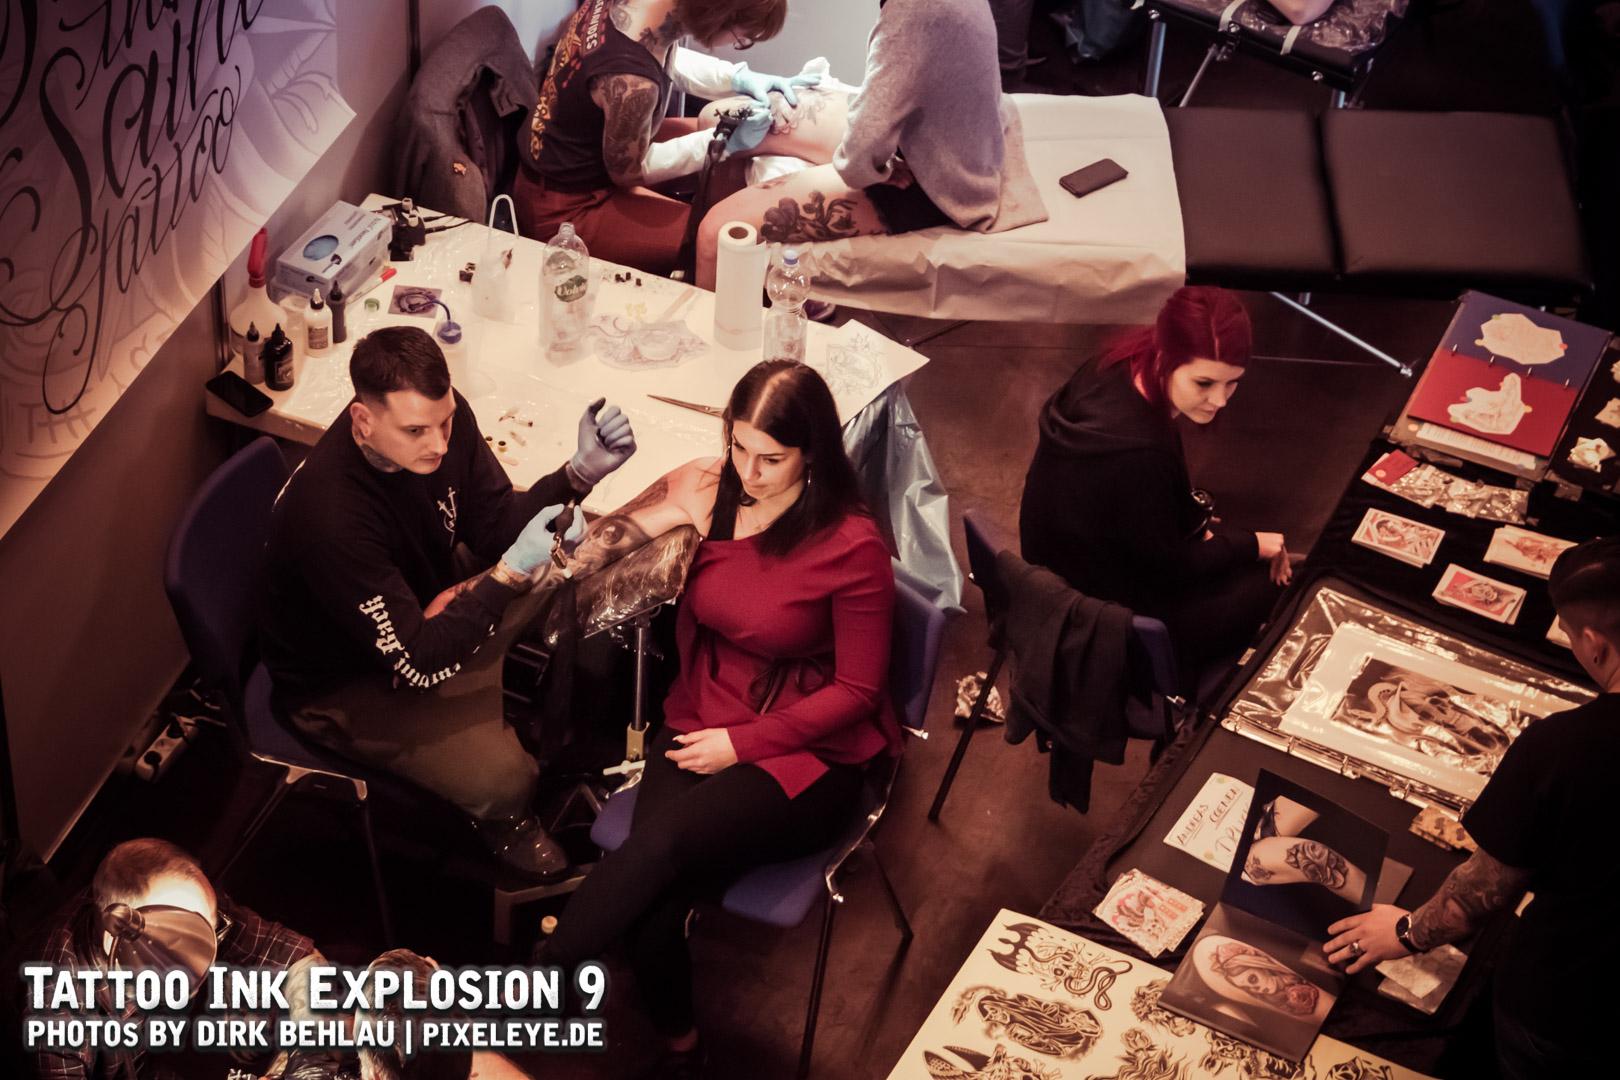 Tattoo Ink Explosion 2018 WEB by Dirk Behlau-0507.jpg